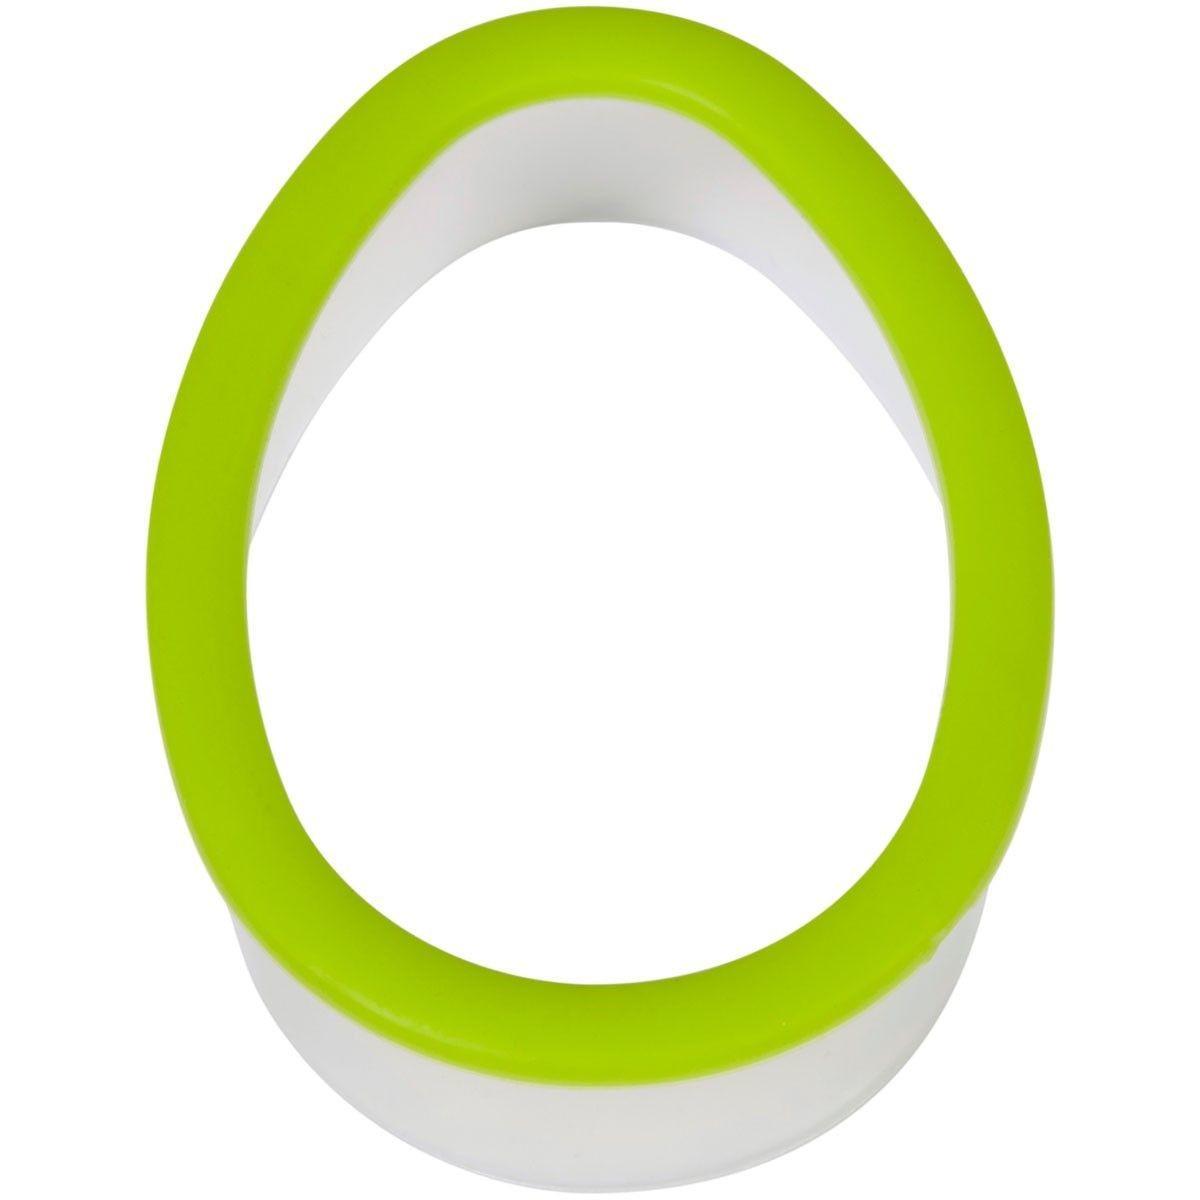 Wilton Easter Plastic Grippy Cutter -EGG -Κουπάτ Αυγό με λαβή σιλικόνης -9.5εκ